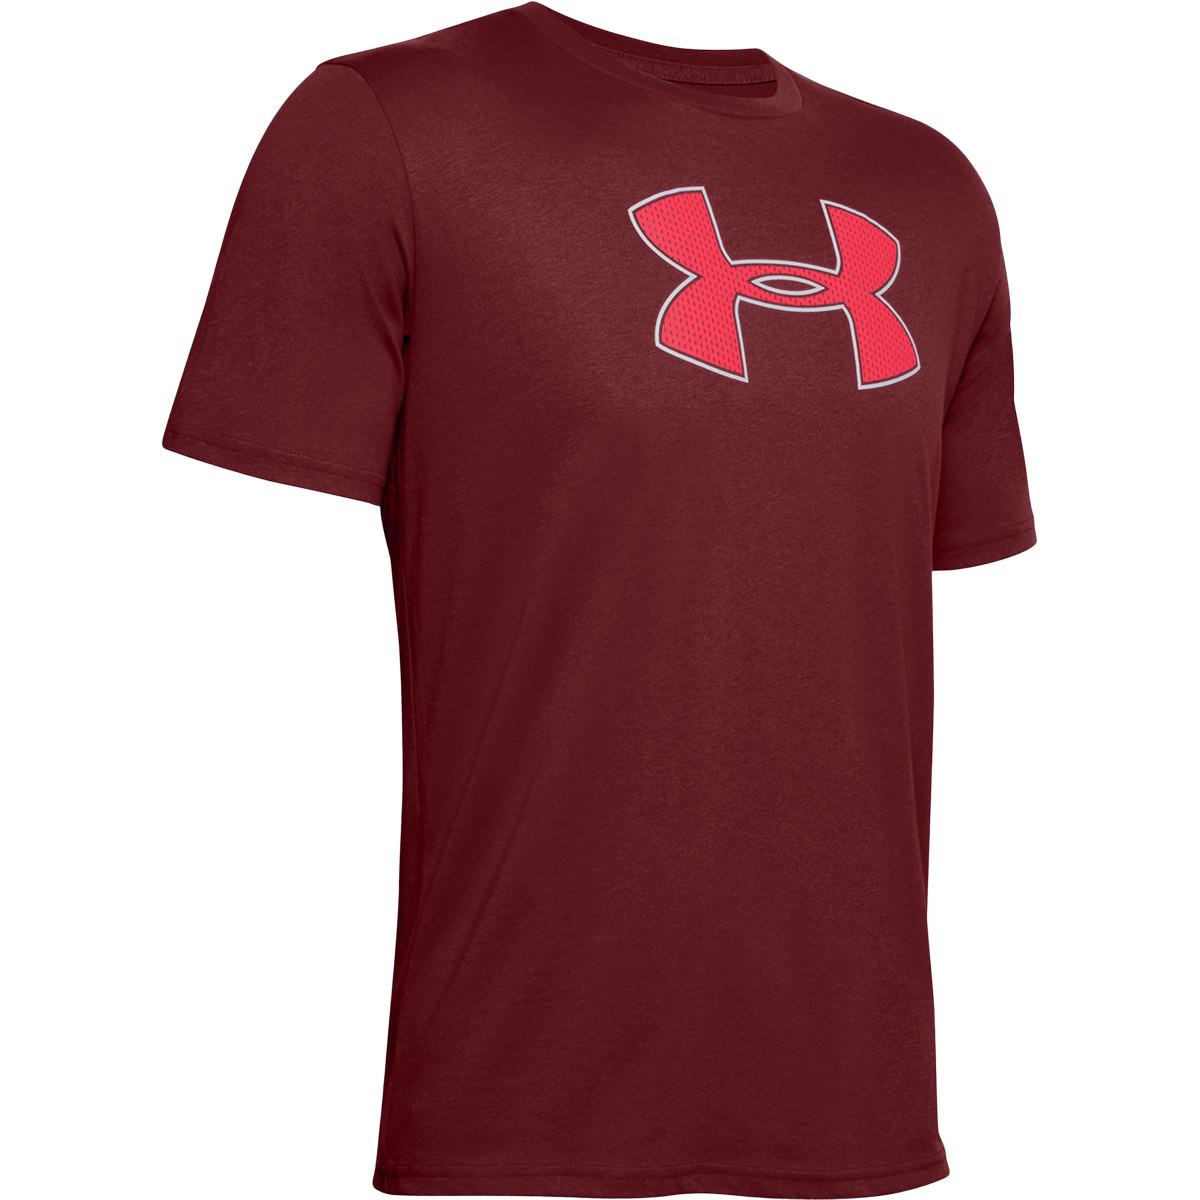 Under Armour Big Logo Trænings T-shirt Herre